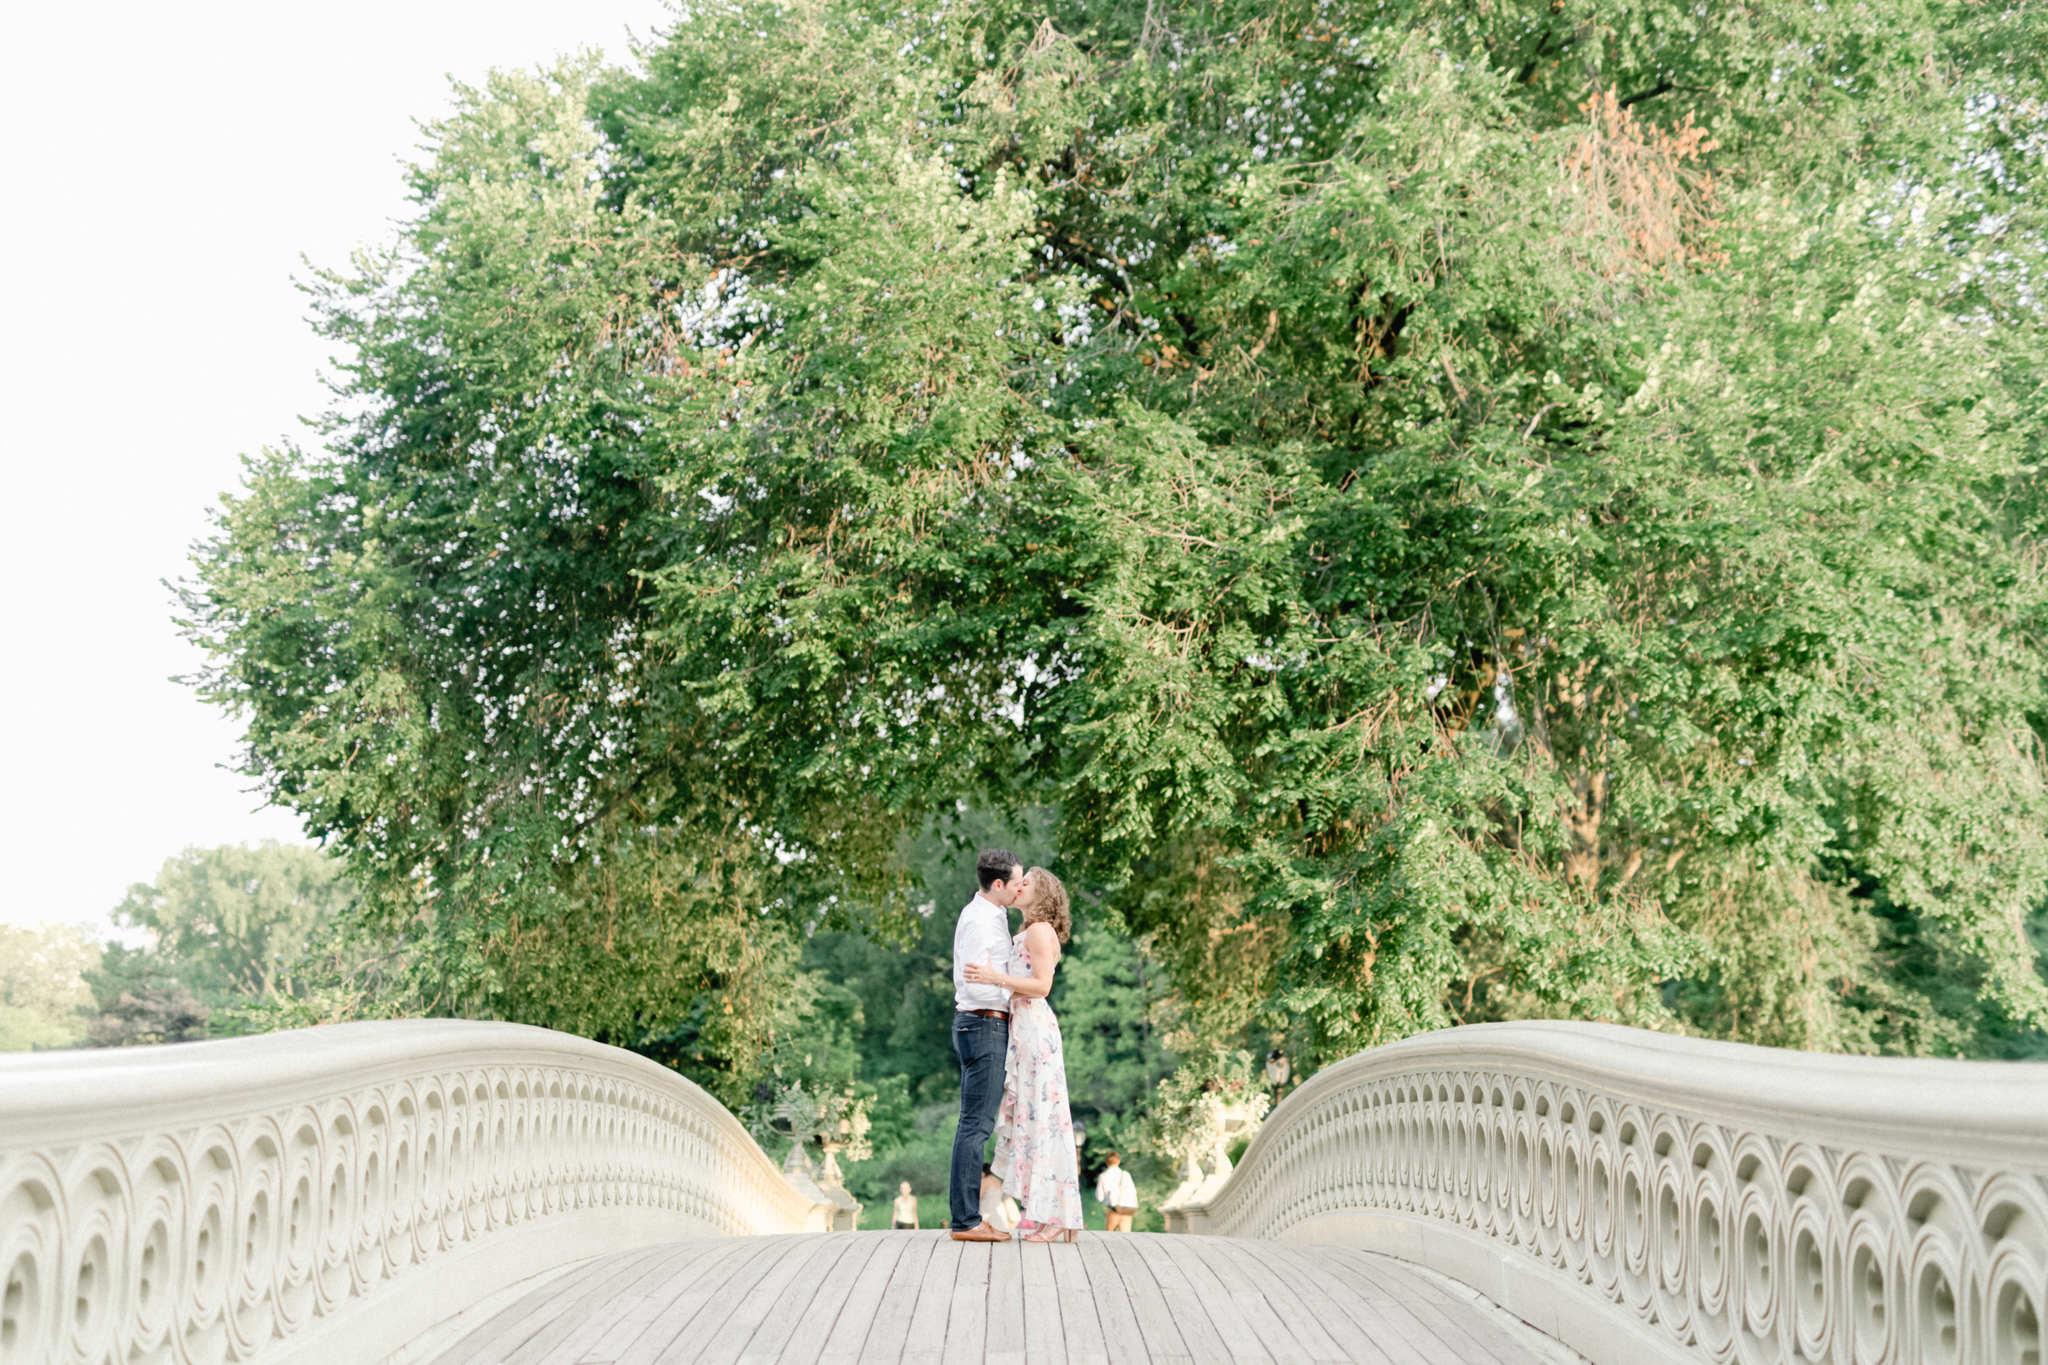 nyc engagement photos_nyc elopement_ct wedding photographer-11.jpg